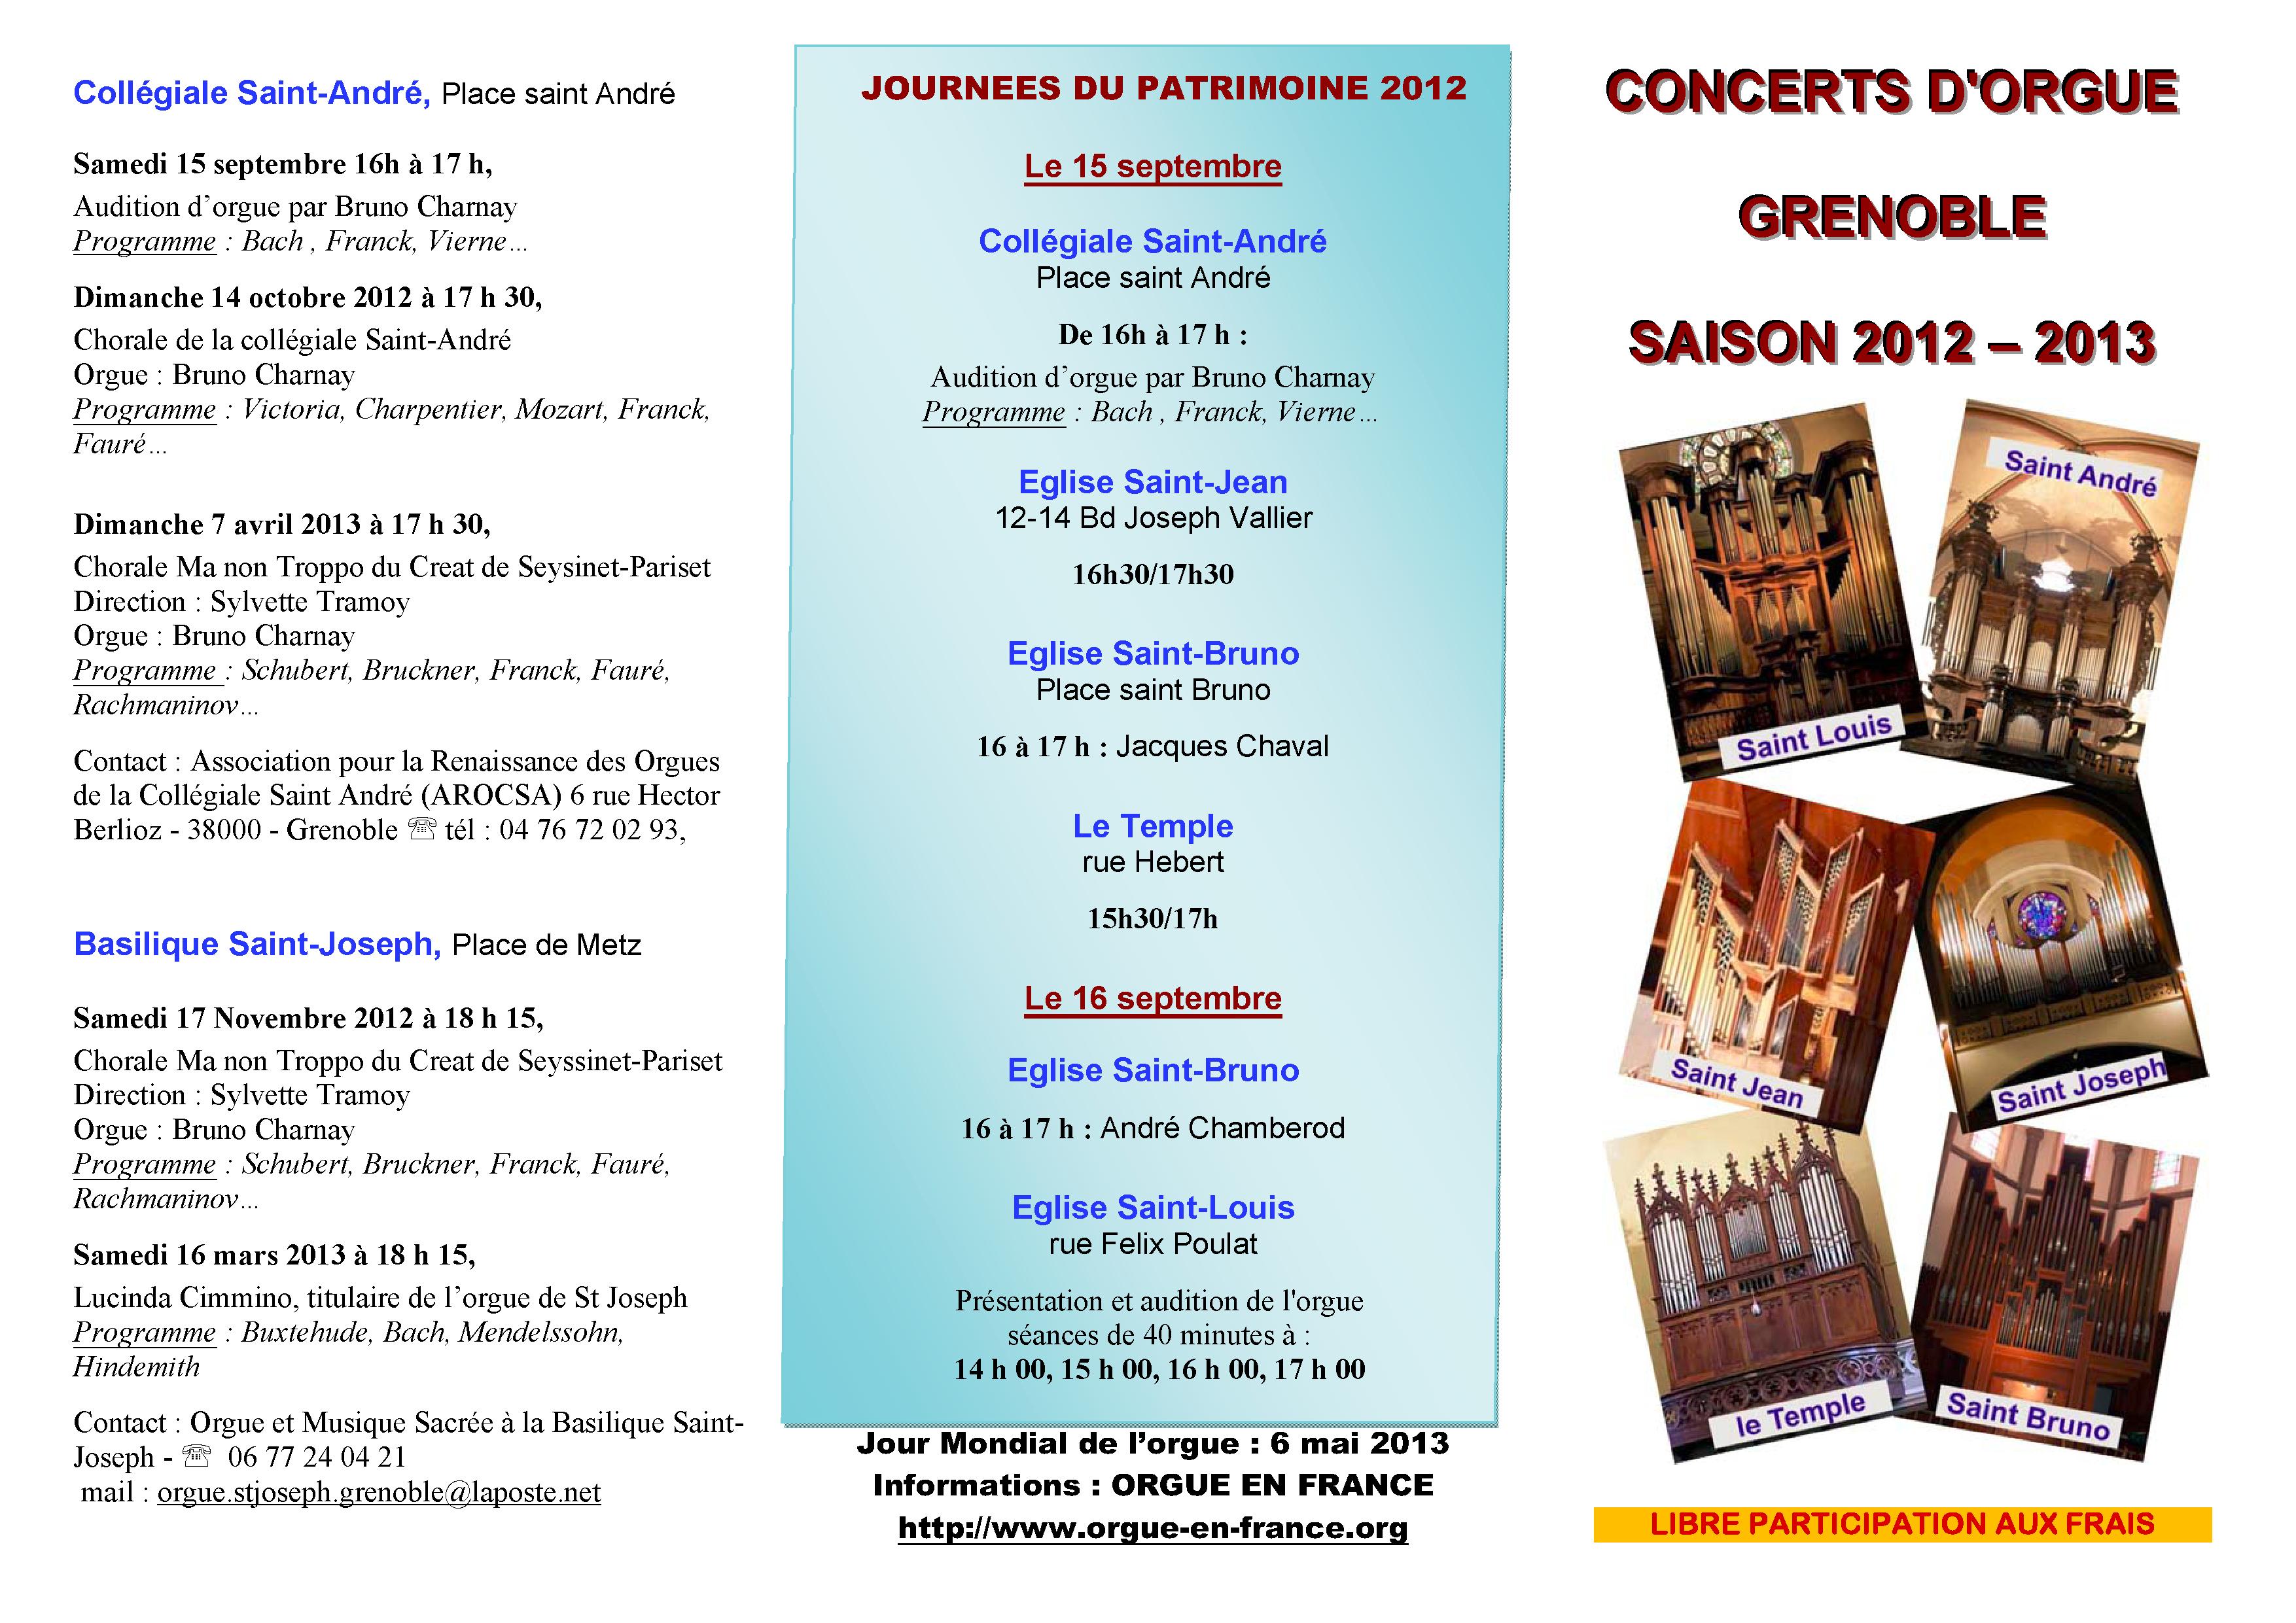 concerts d orgue grenoble saison 2012 2013 grenoble. Black Bedroom Furniture Sets. Home Design Ideas